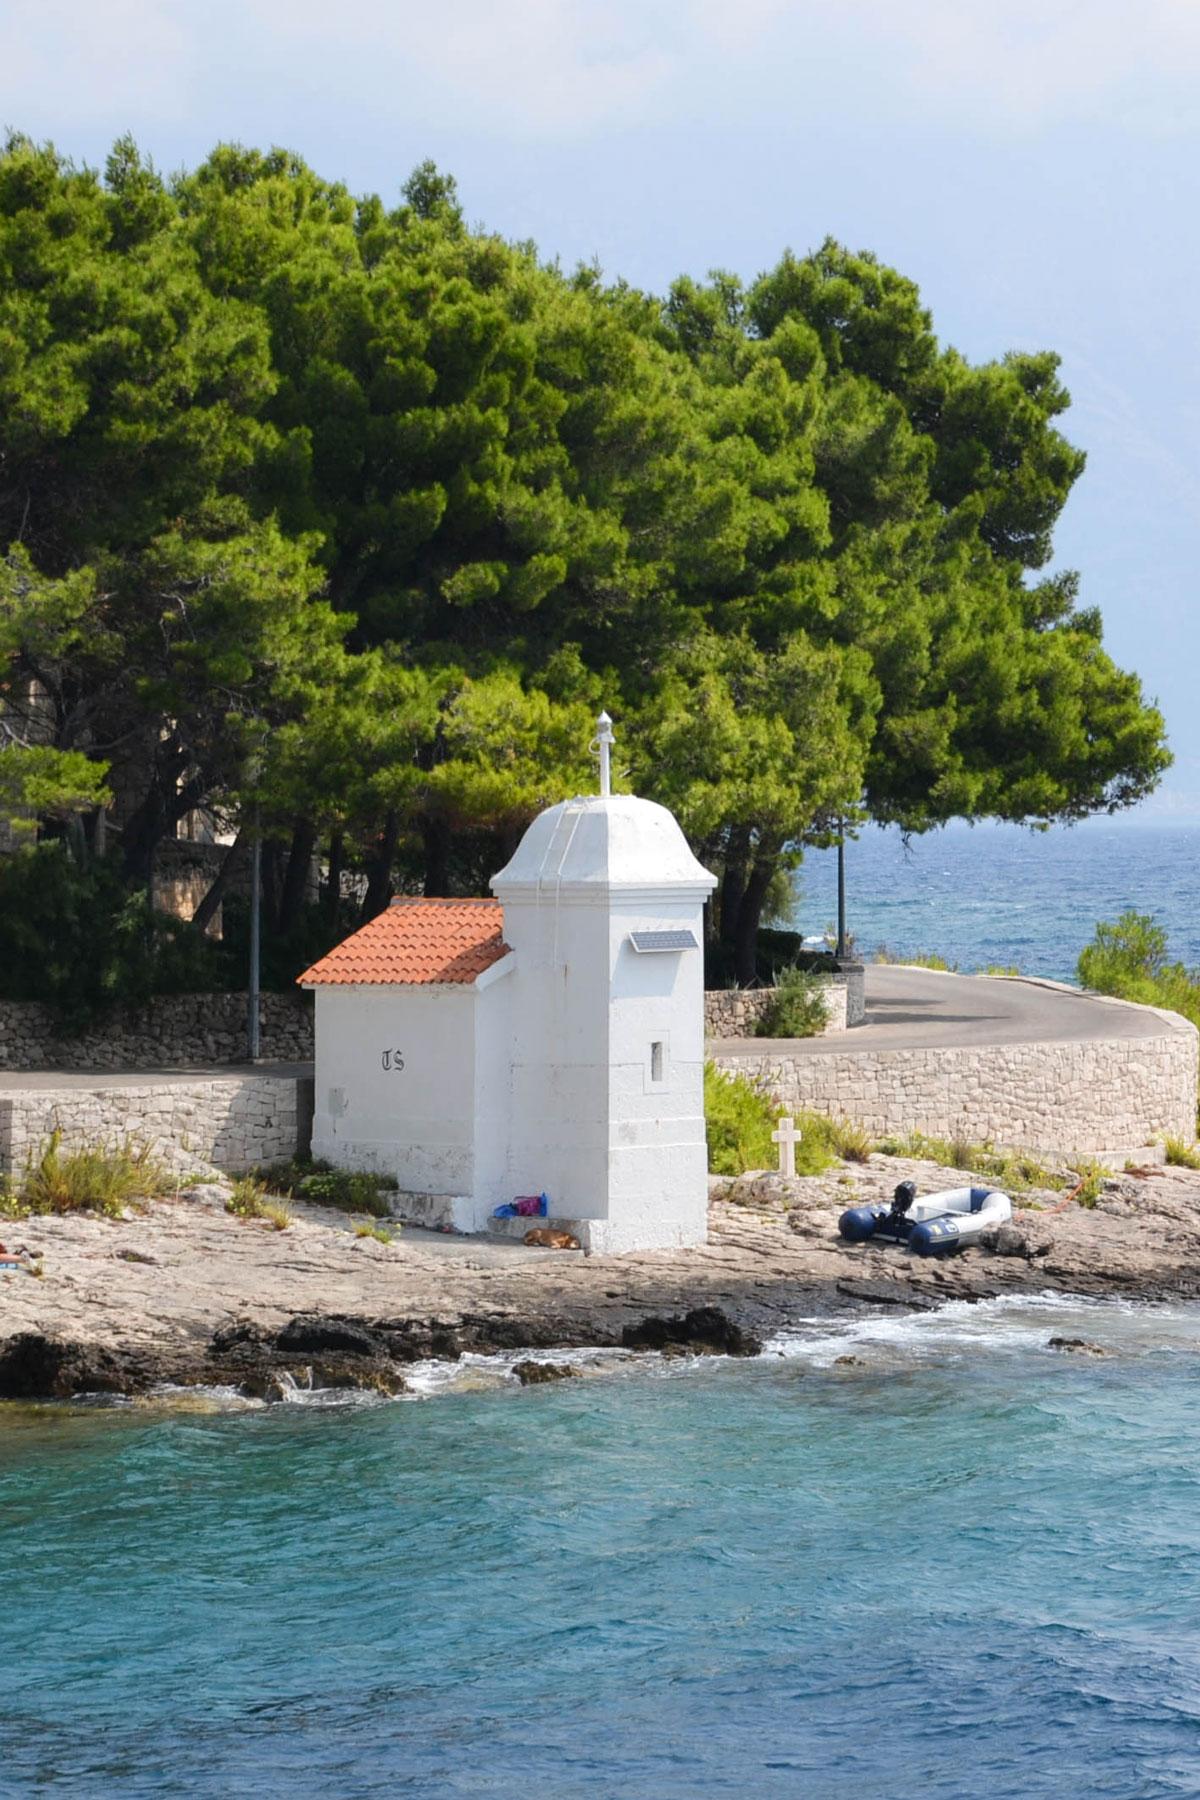 Sumartin-Brac-Island-Croatia-chapel-port